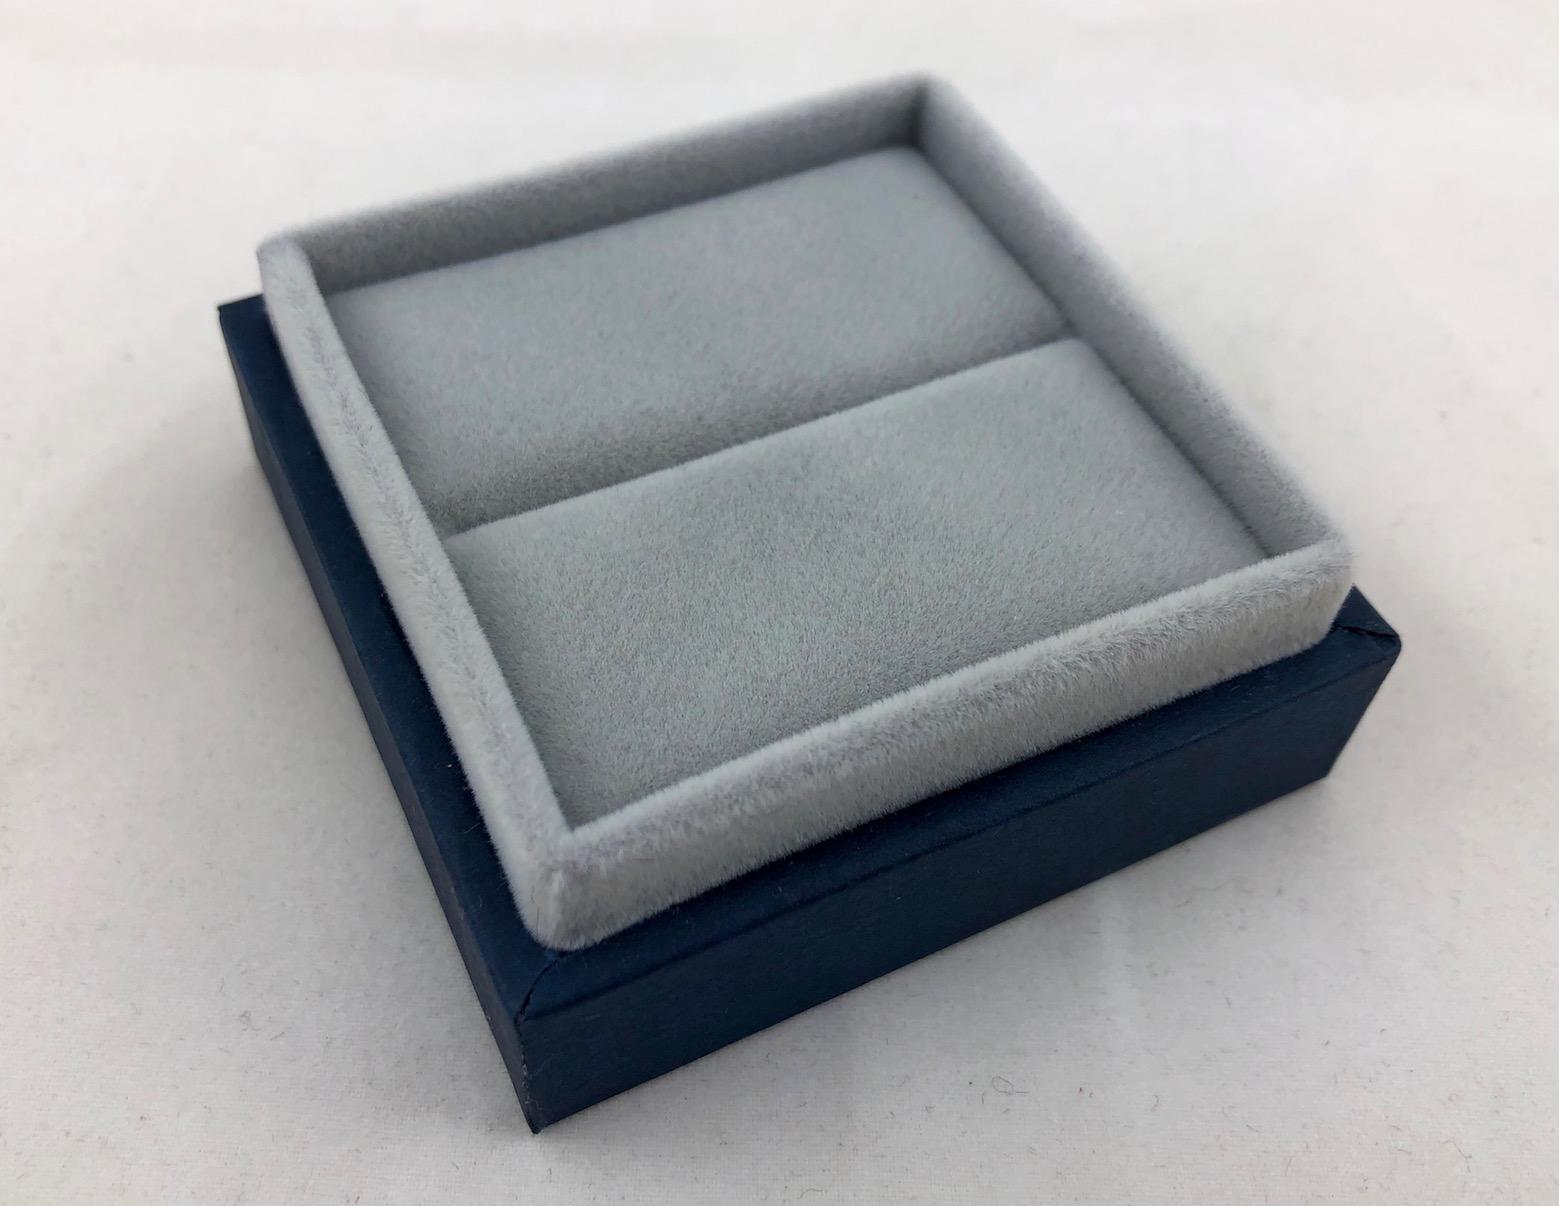 New Blue Envy Ring Box